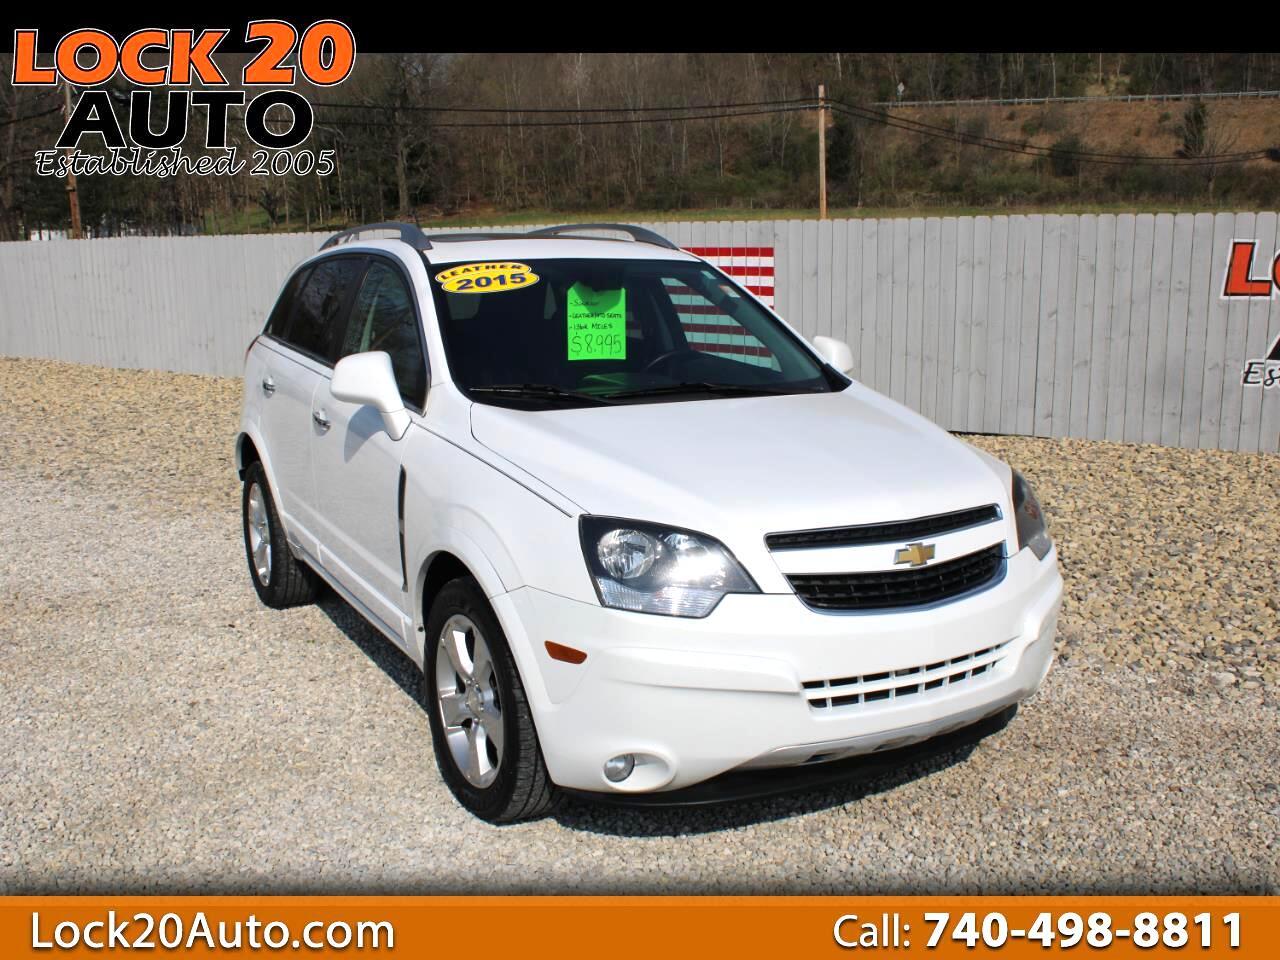 Chevrolet Captiva Sport LTZ FWD 2015